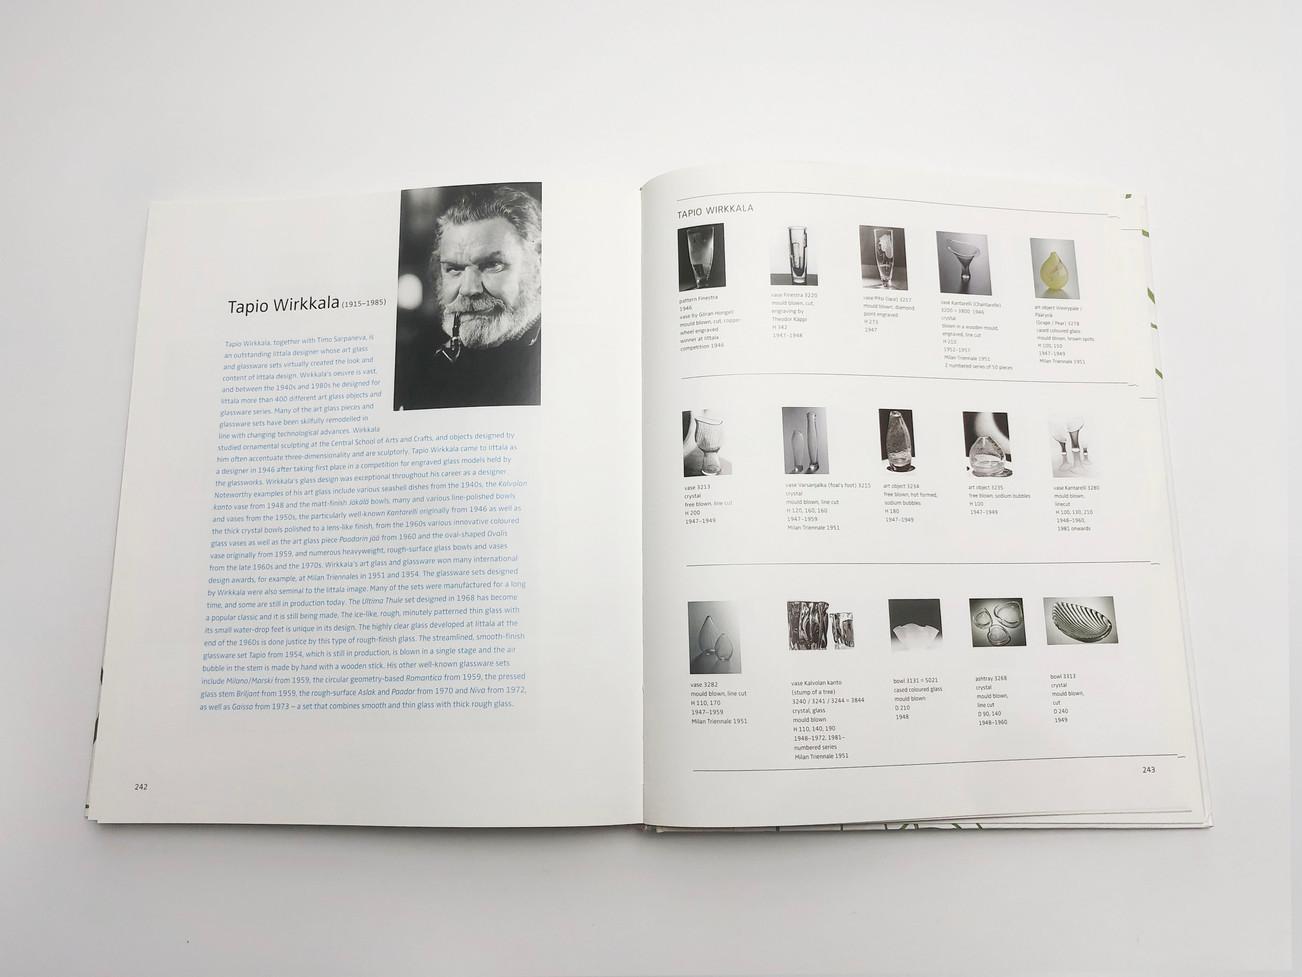 Iittala: 125 Years of Finnish Glass